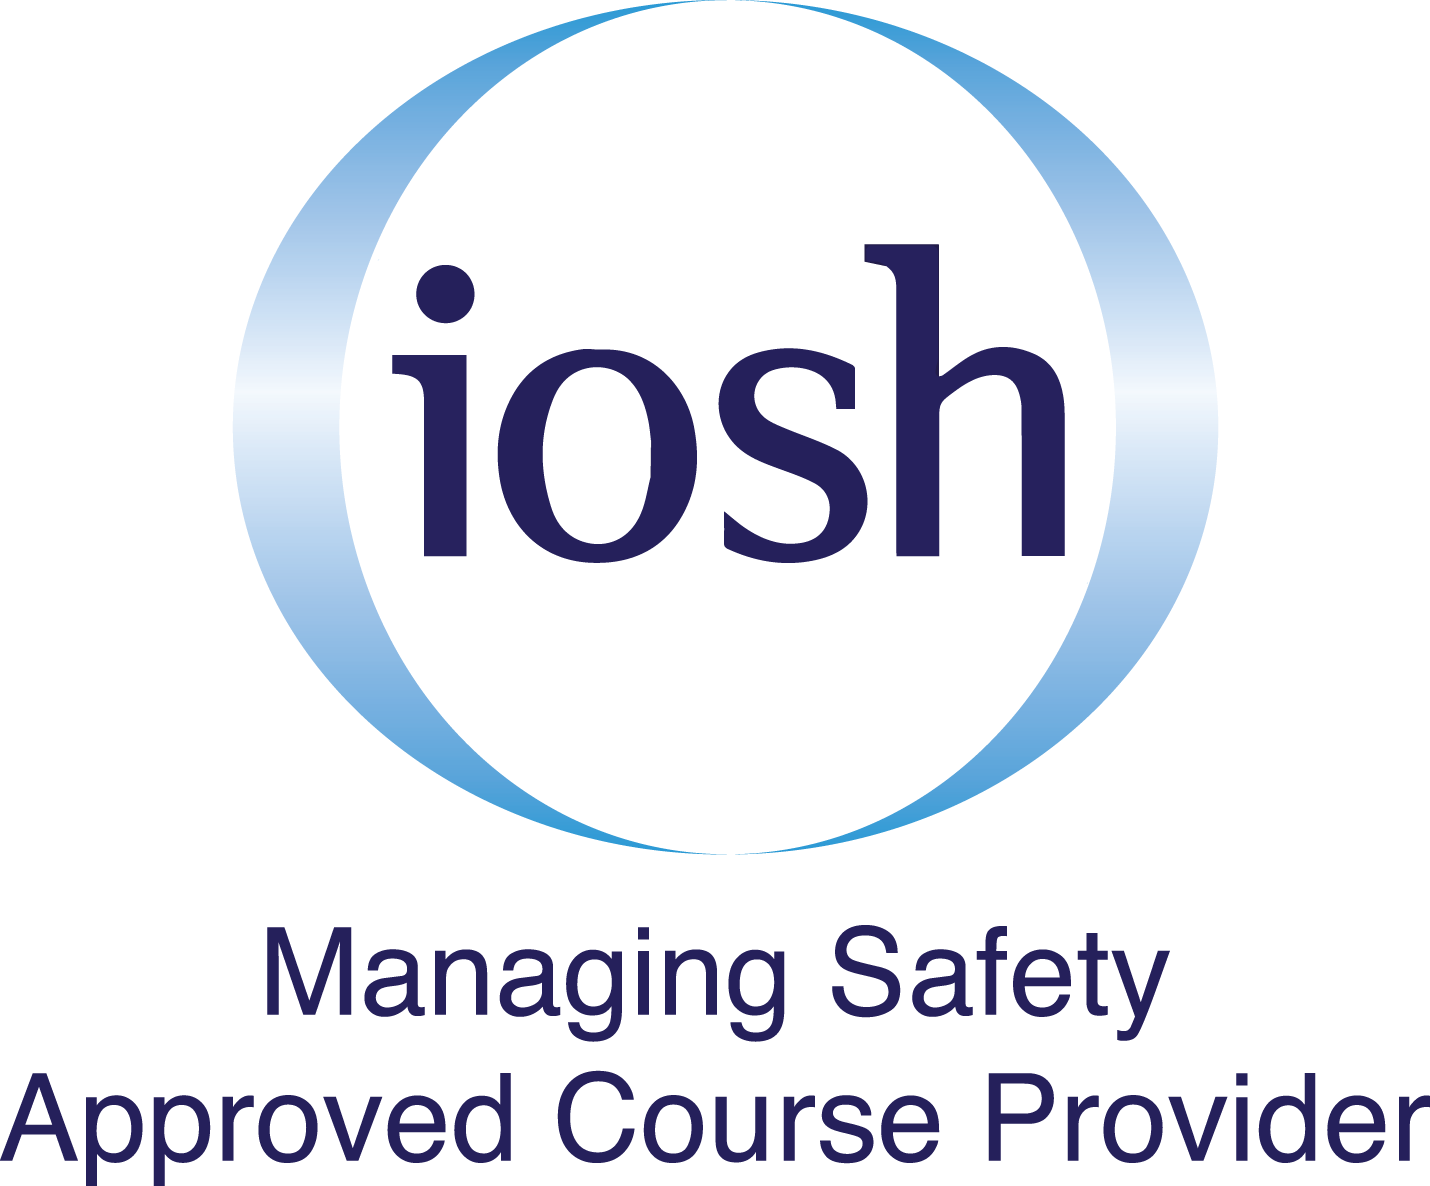 iosh accreditation